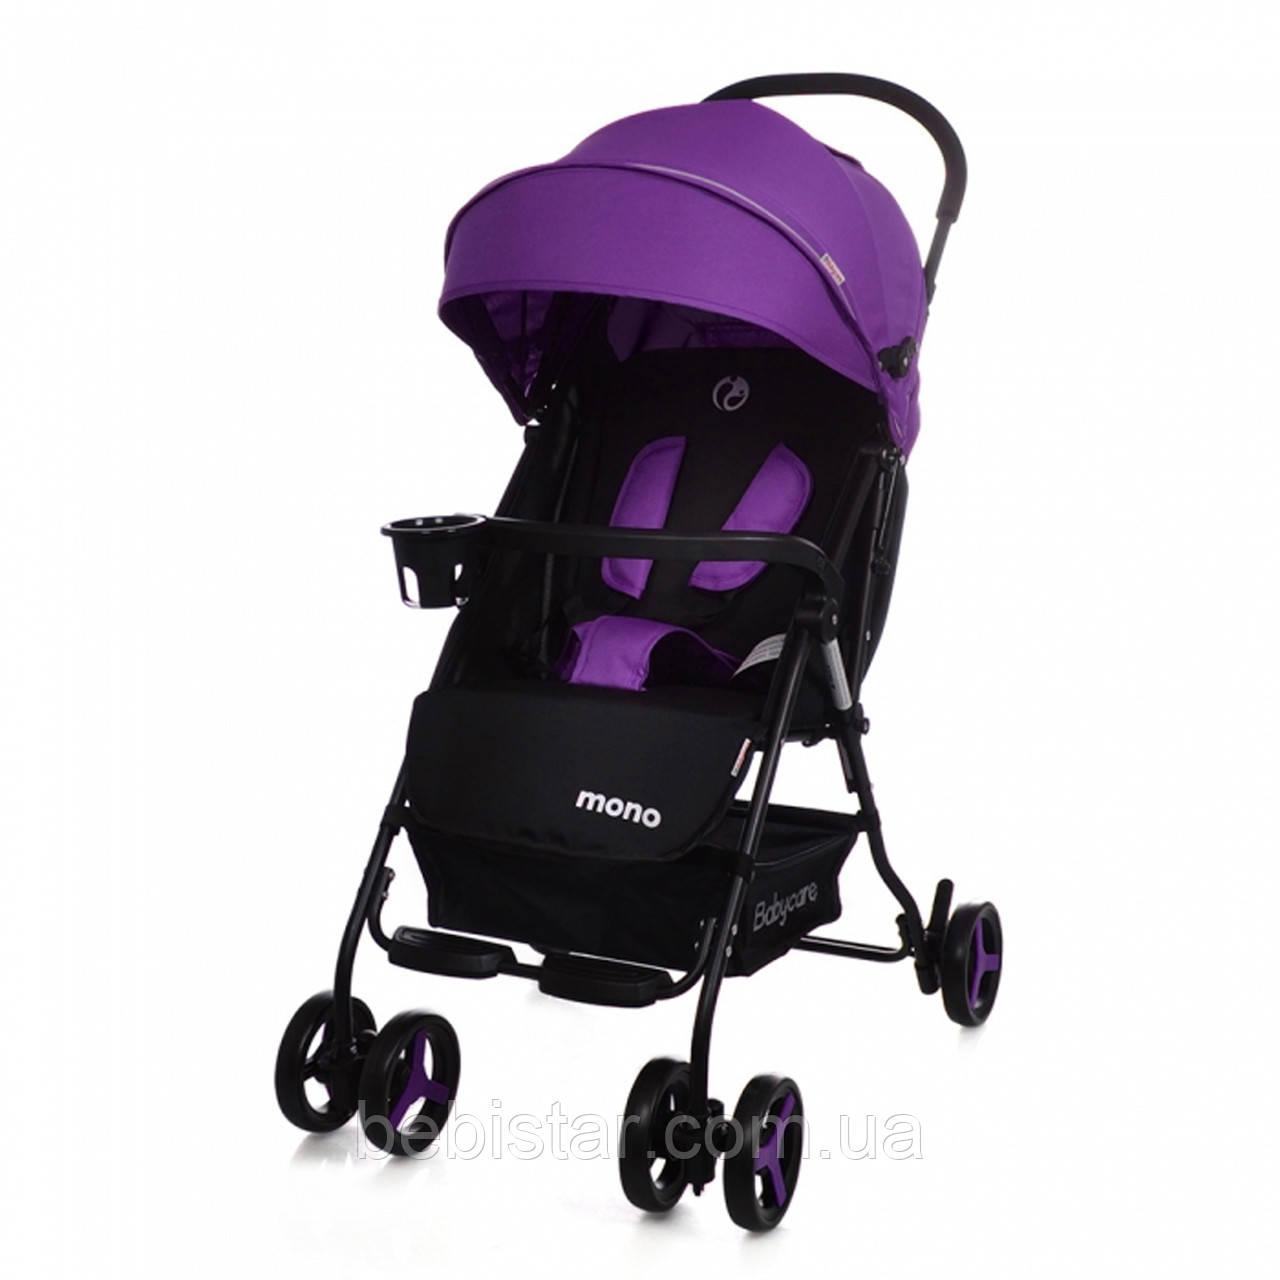 Детская коляска BABYCARE Mono BC-1417  Purple для деток 6 до 36 месяцев